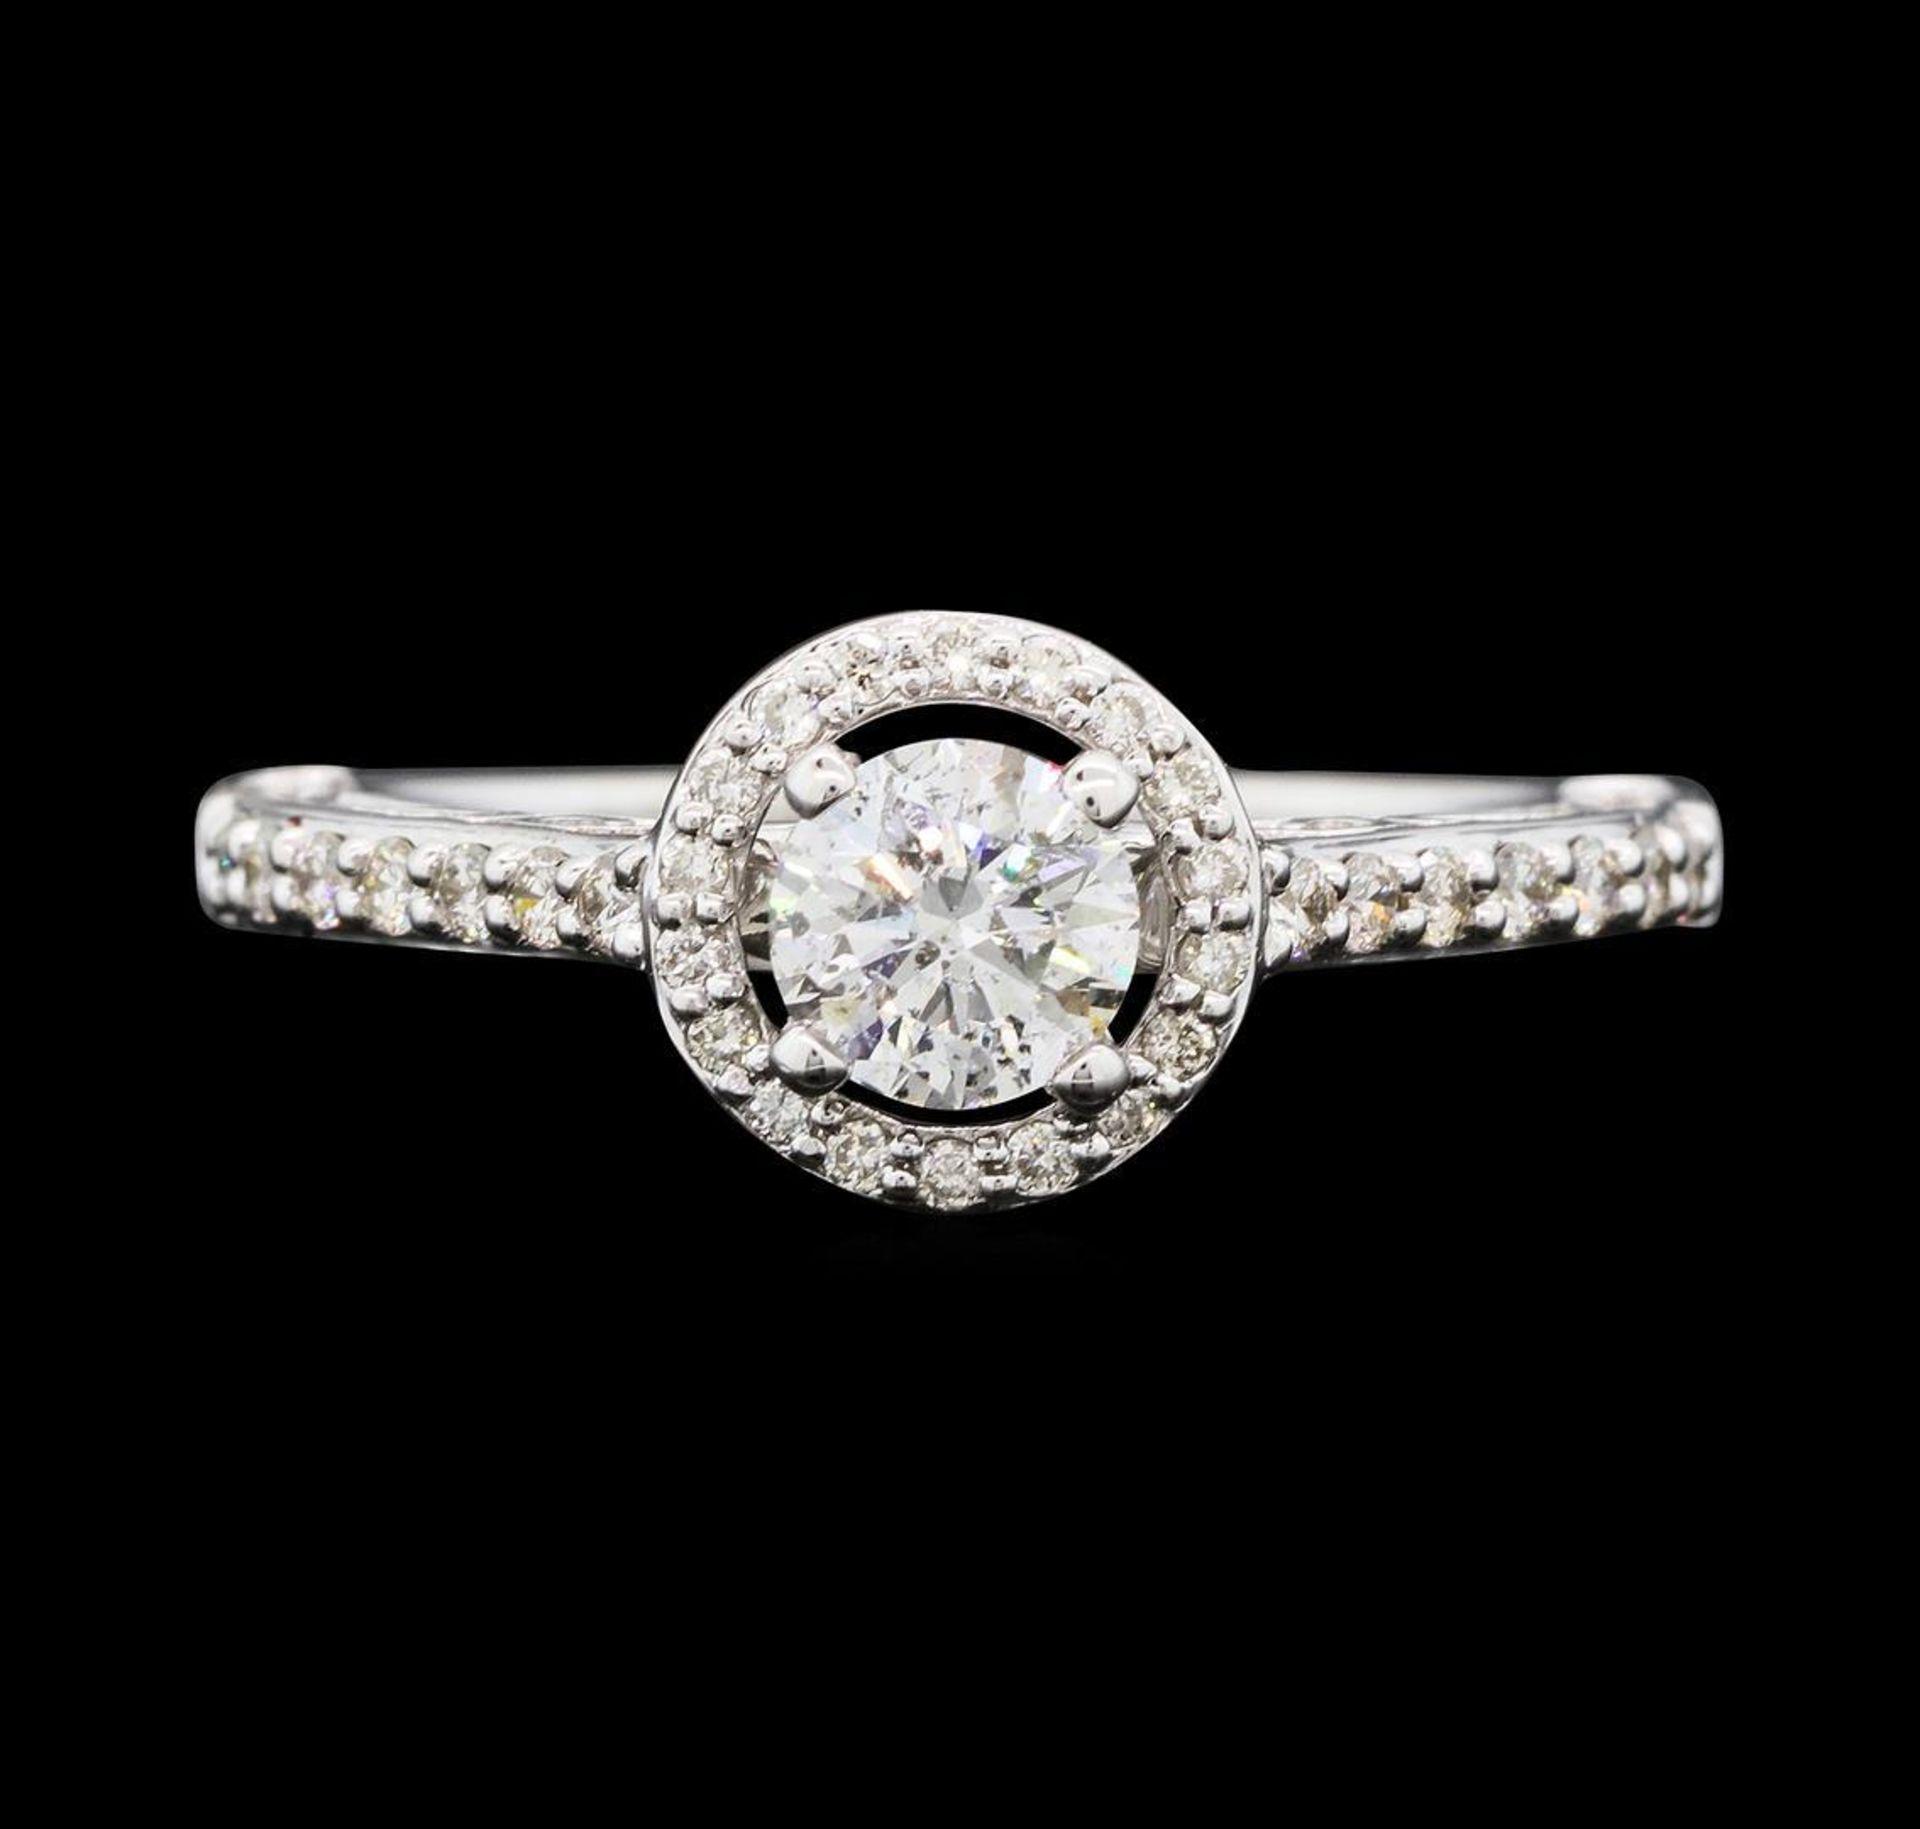 0.79 ctw Diamond Ring - 14KT White Gold - Image 2 of 5